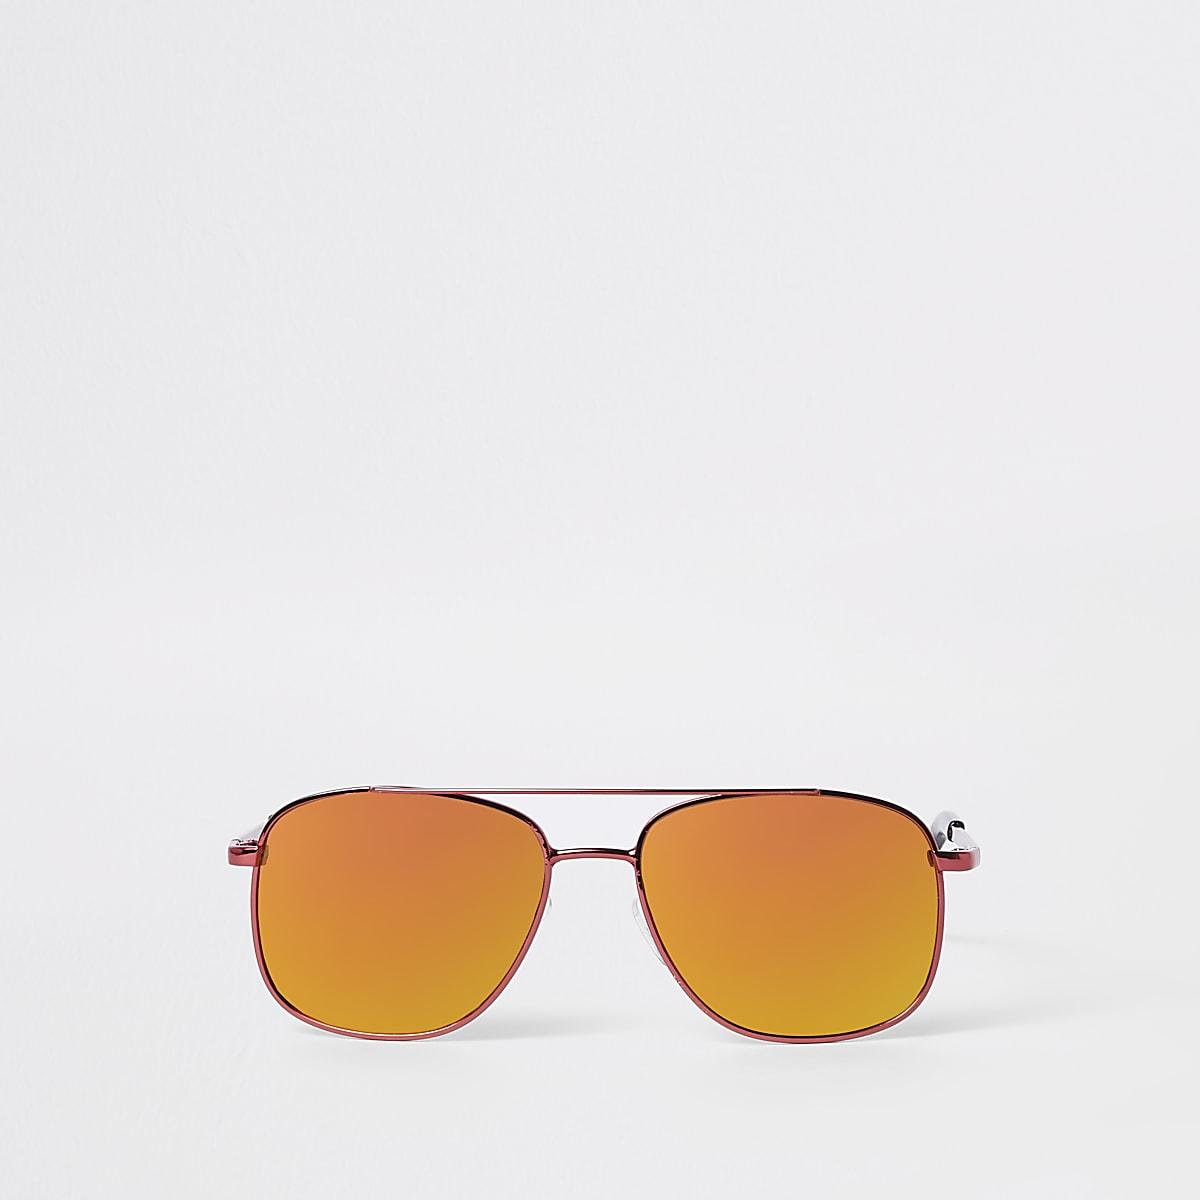 Boys red round aviator sunglasses